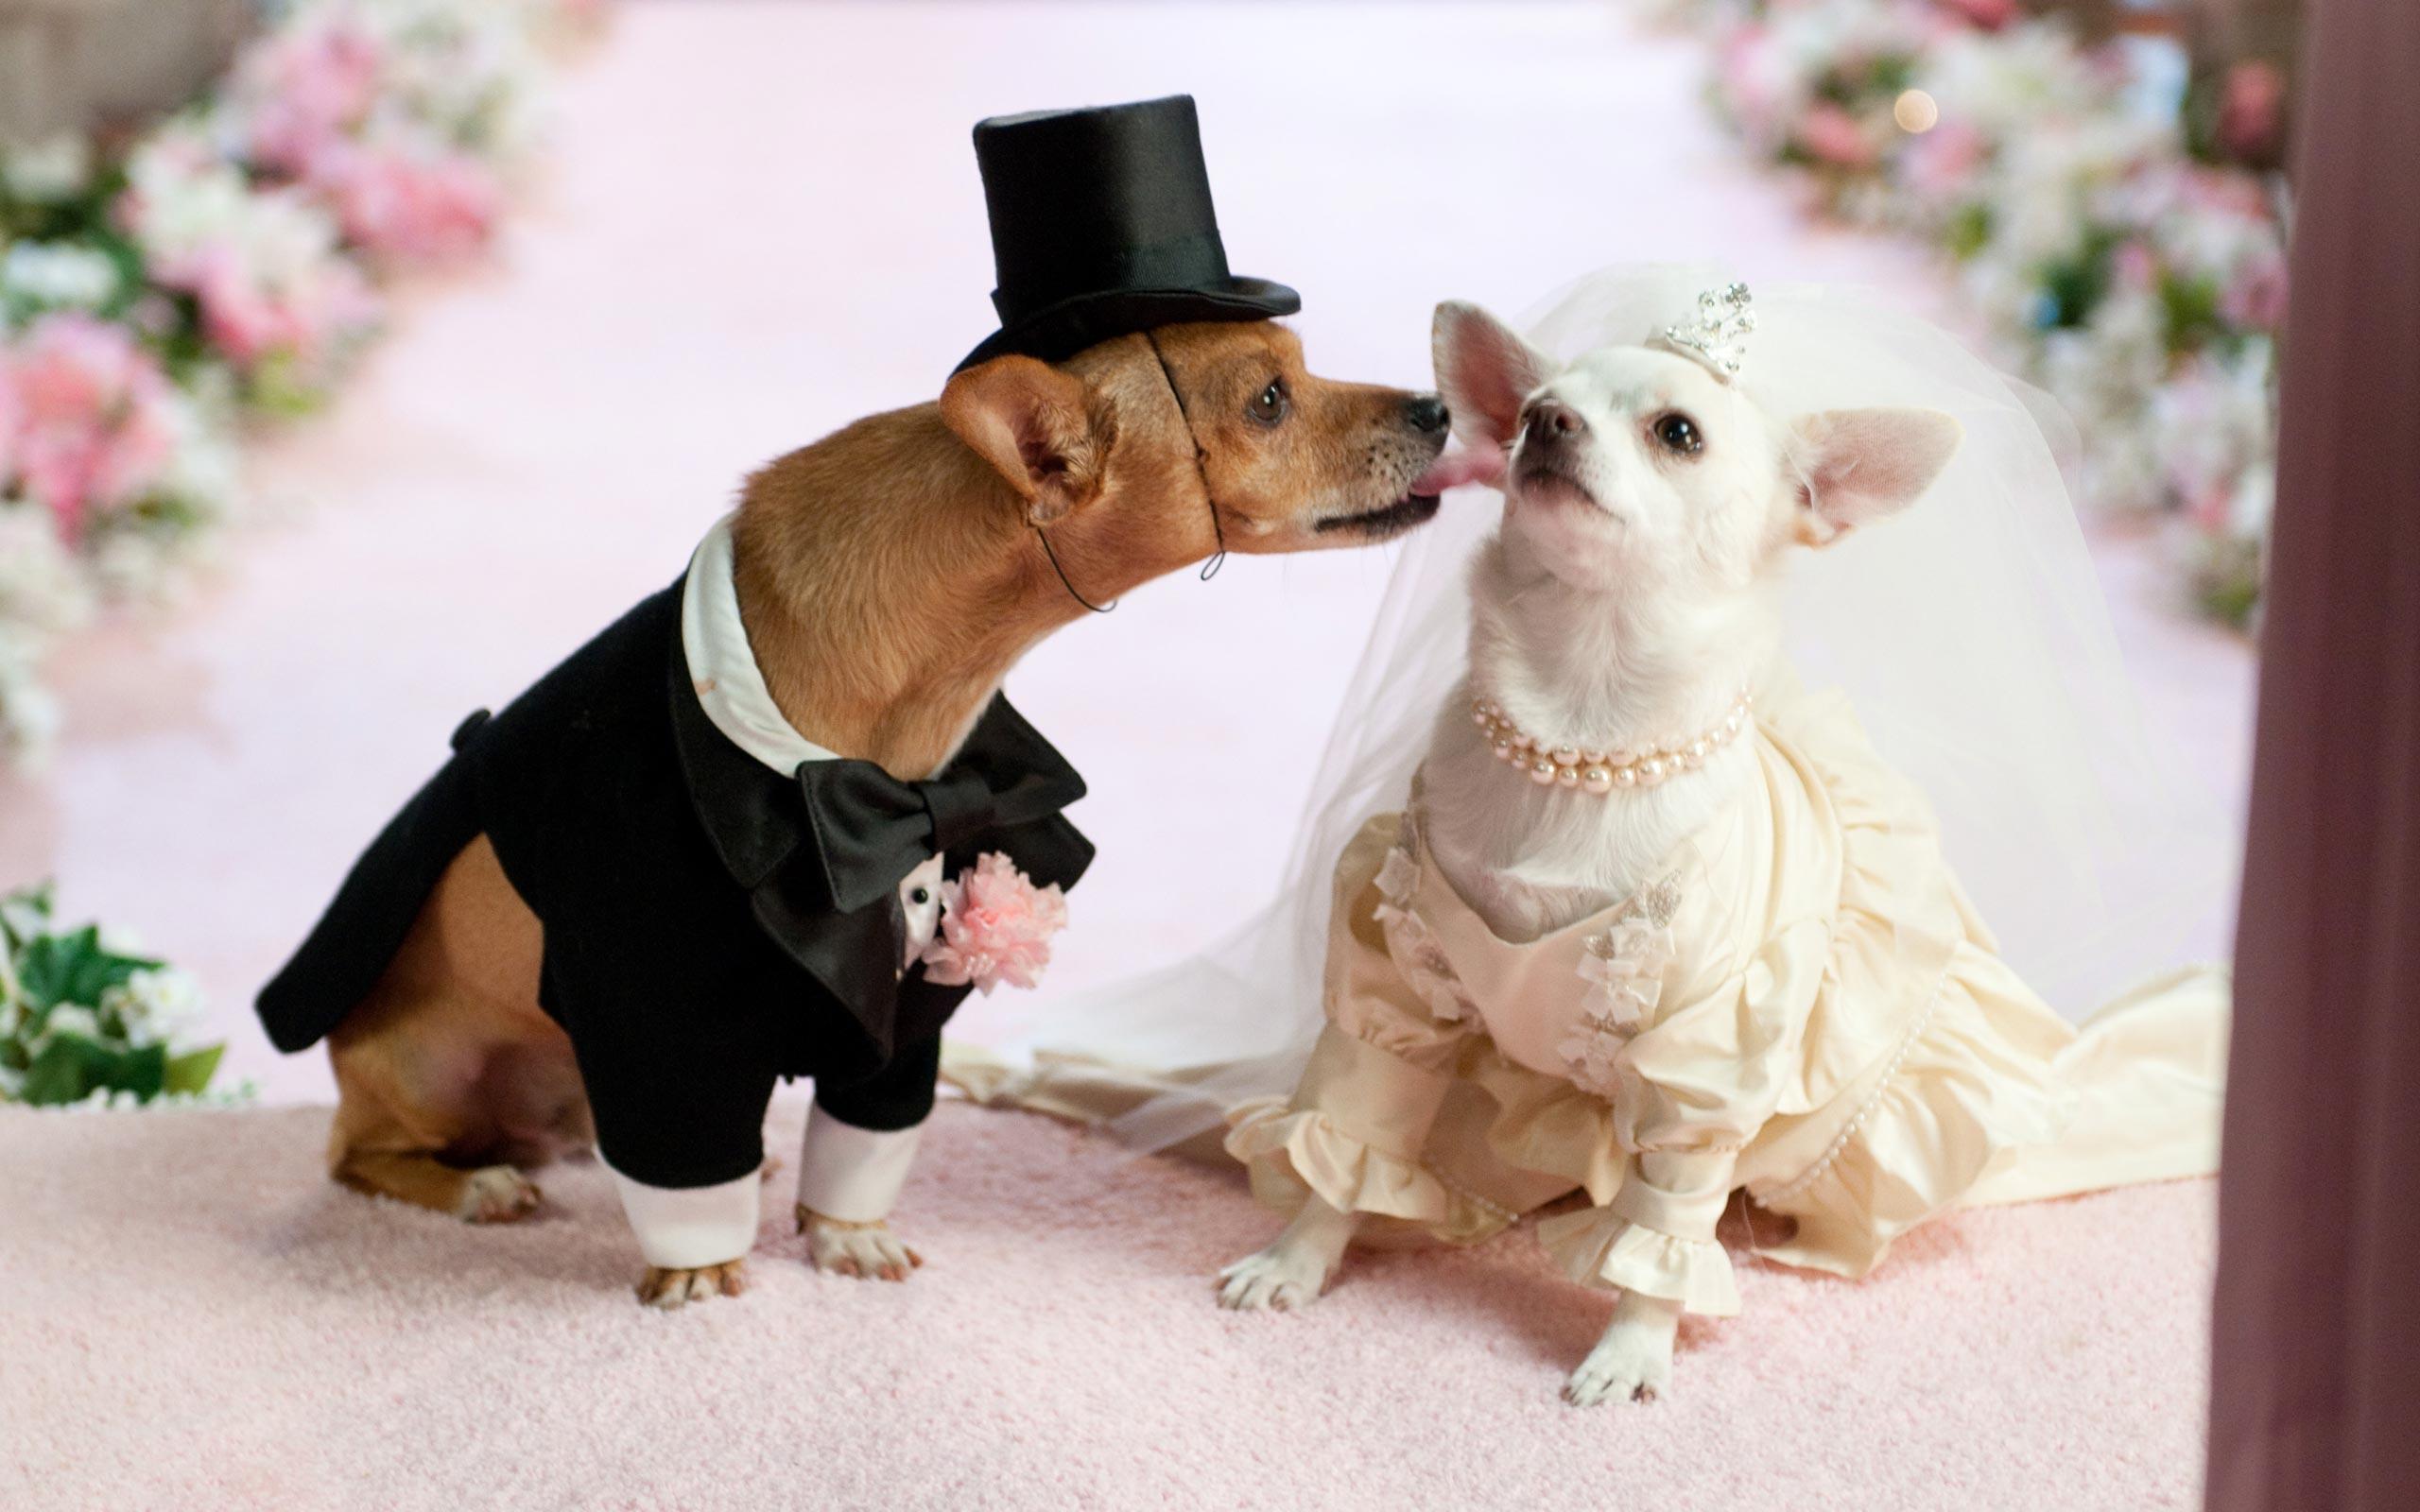 hilarious-animal-pictures-hilarious-animal-wedding-hilarious-dog-pictures-hilarious-Dog-Wedding